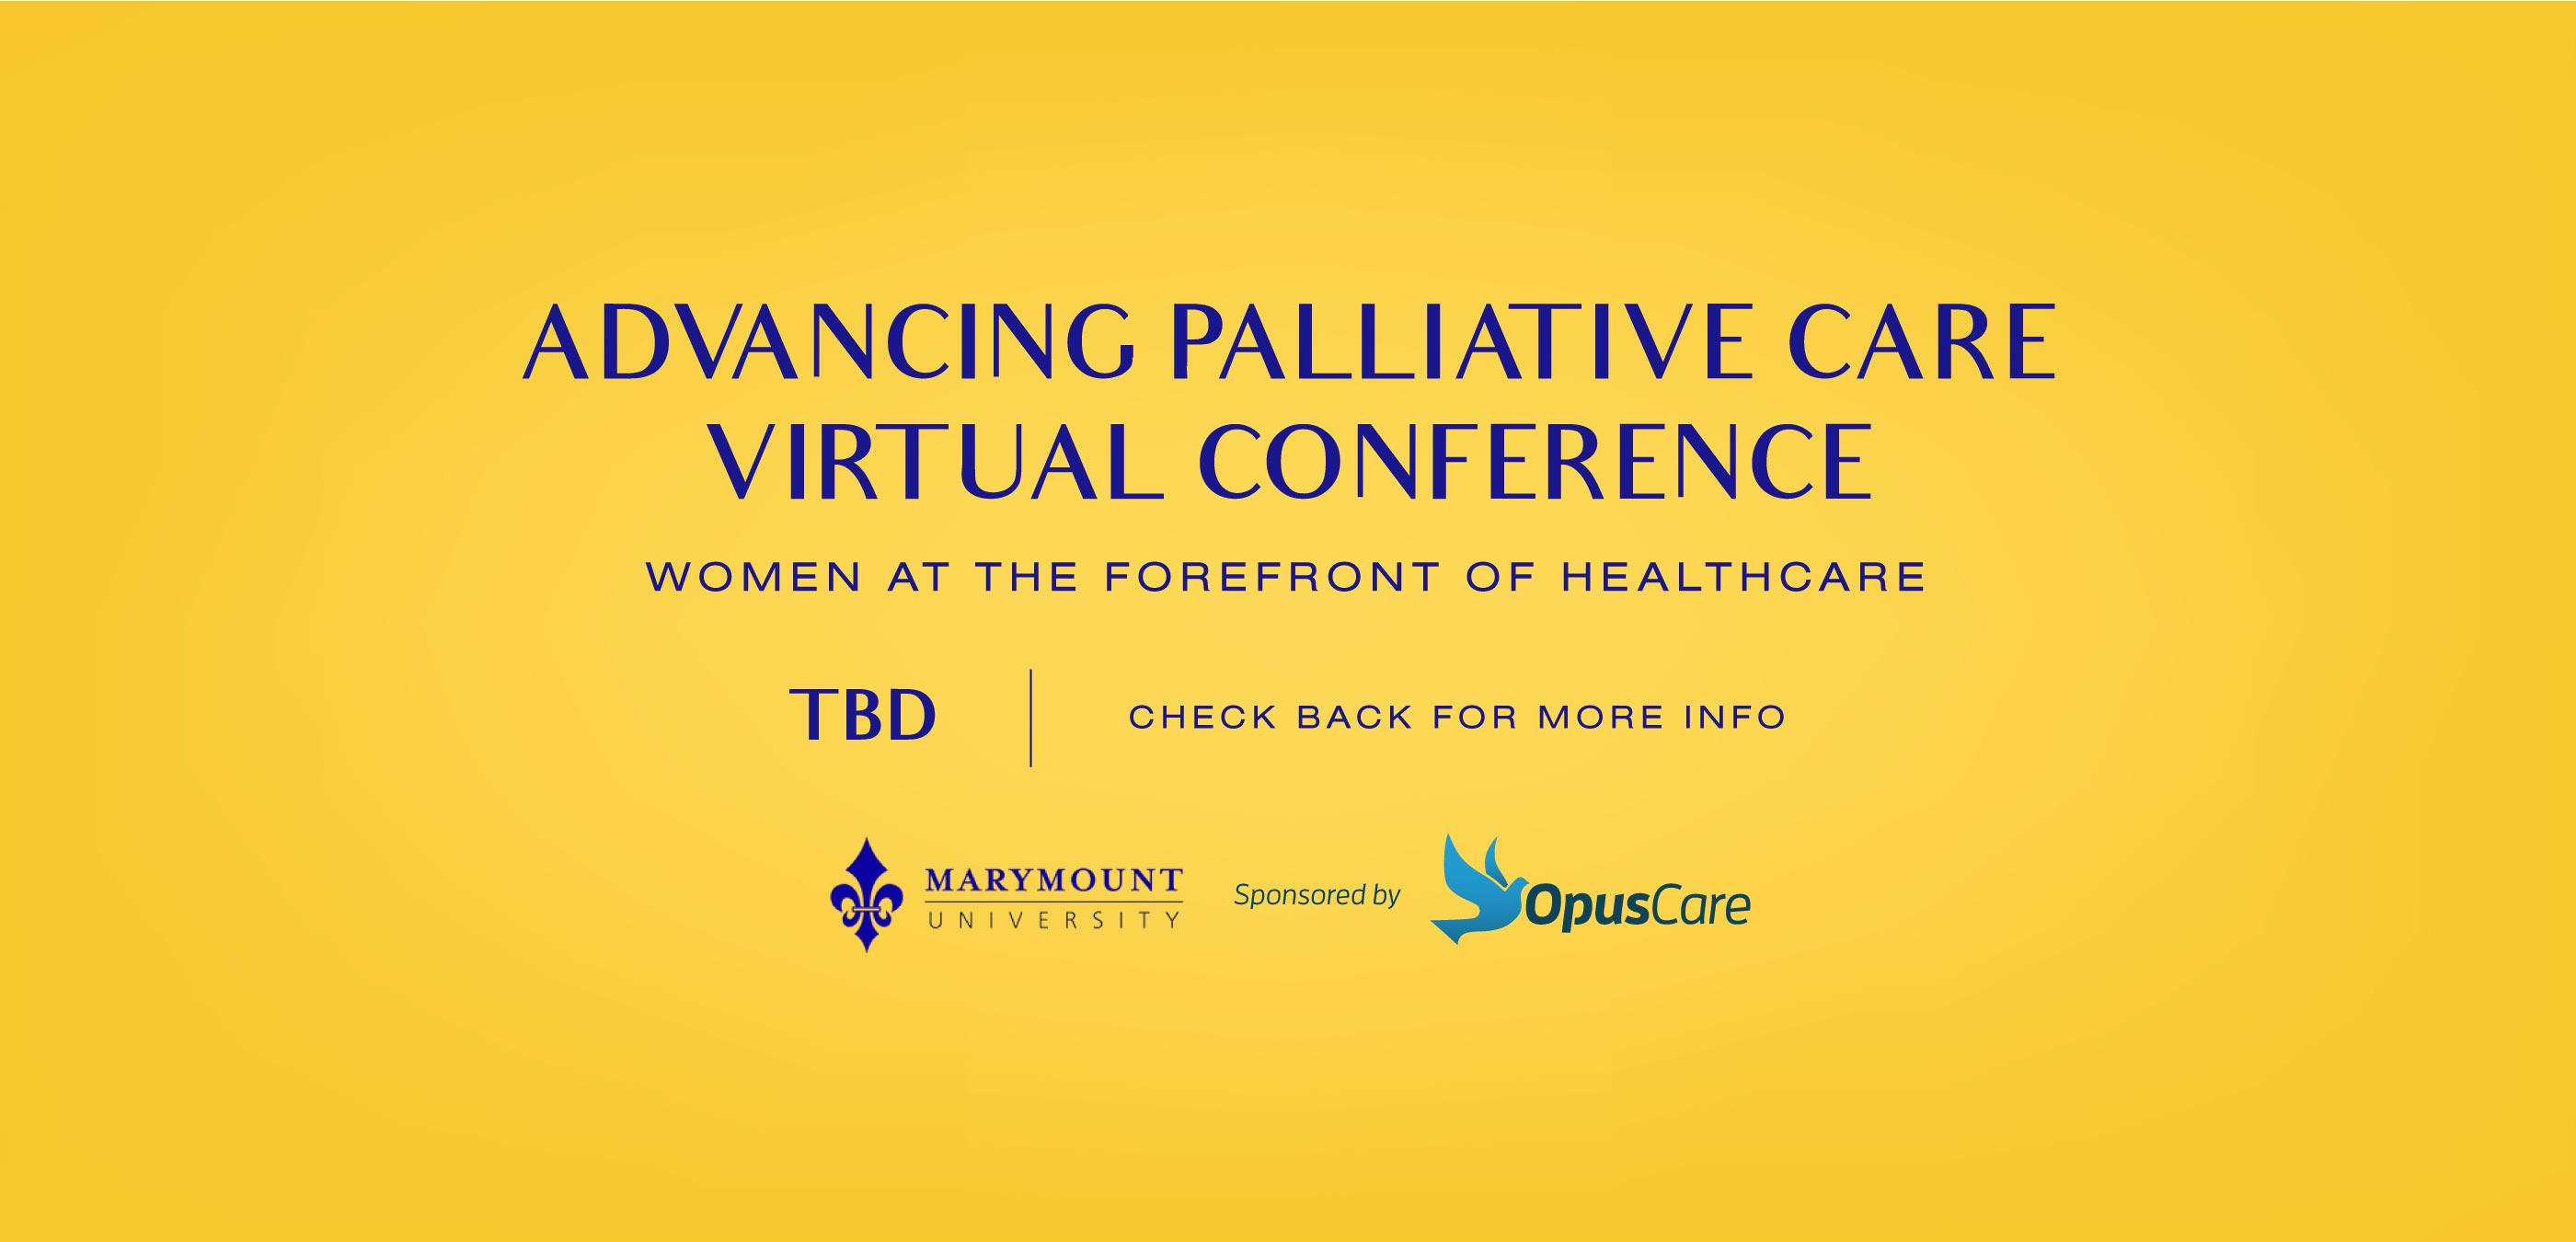 Advancing Palliative Care Virtual Conference desktop banner